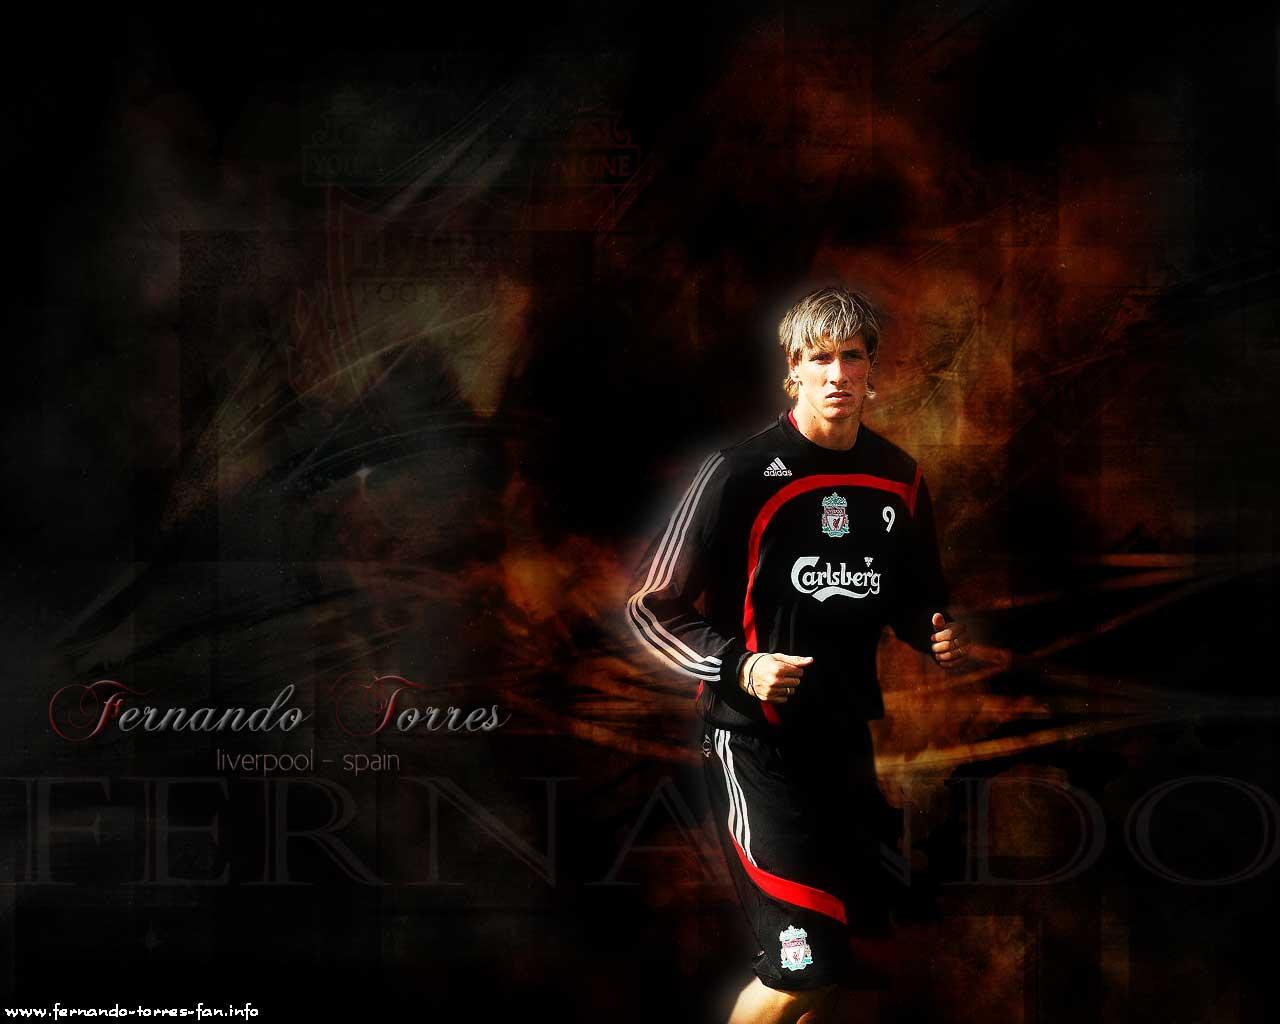 Fernando Torres Wallpaper celebrity sport 1280x1024